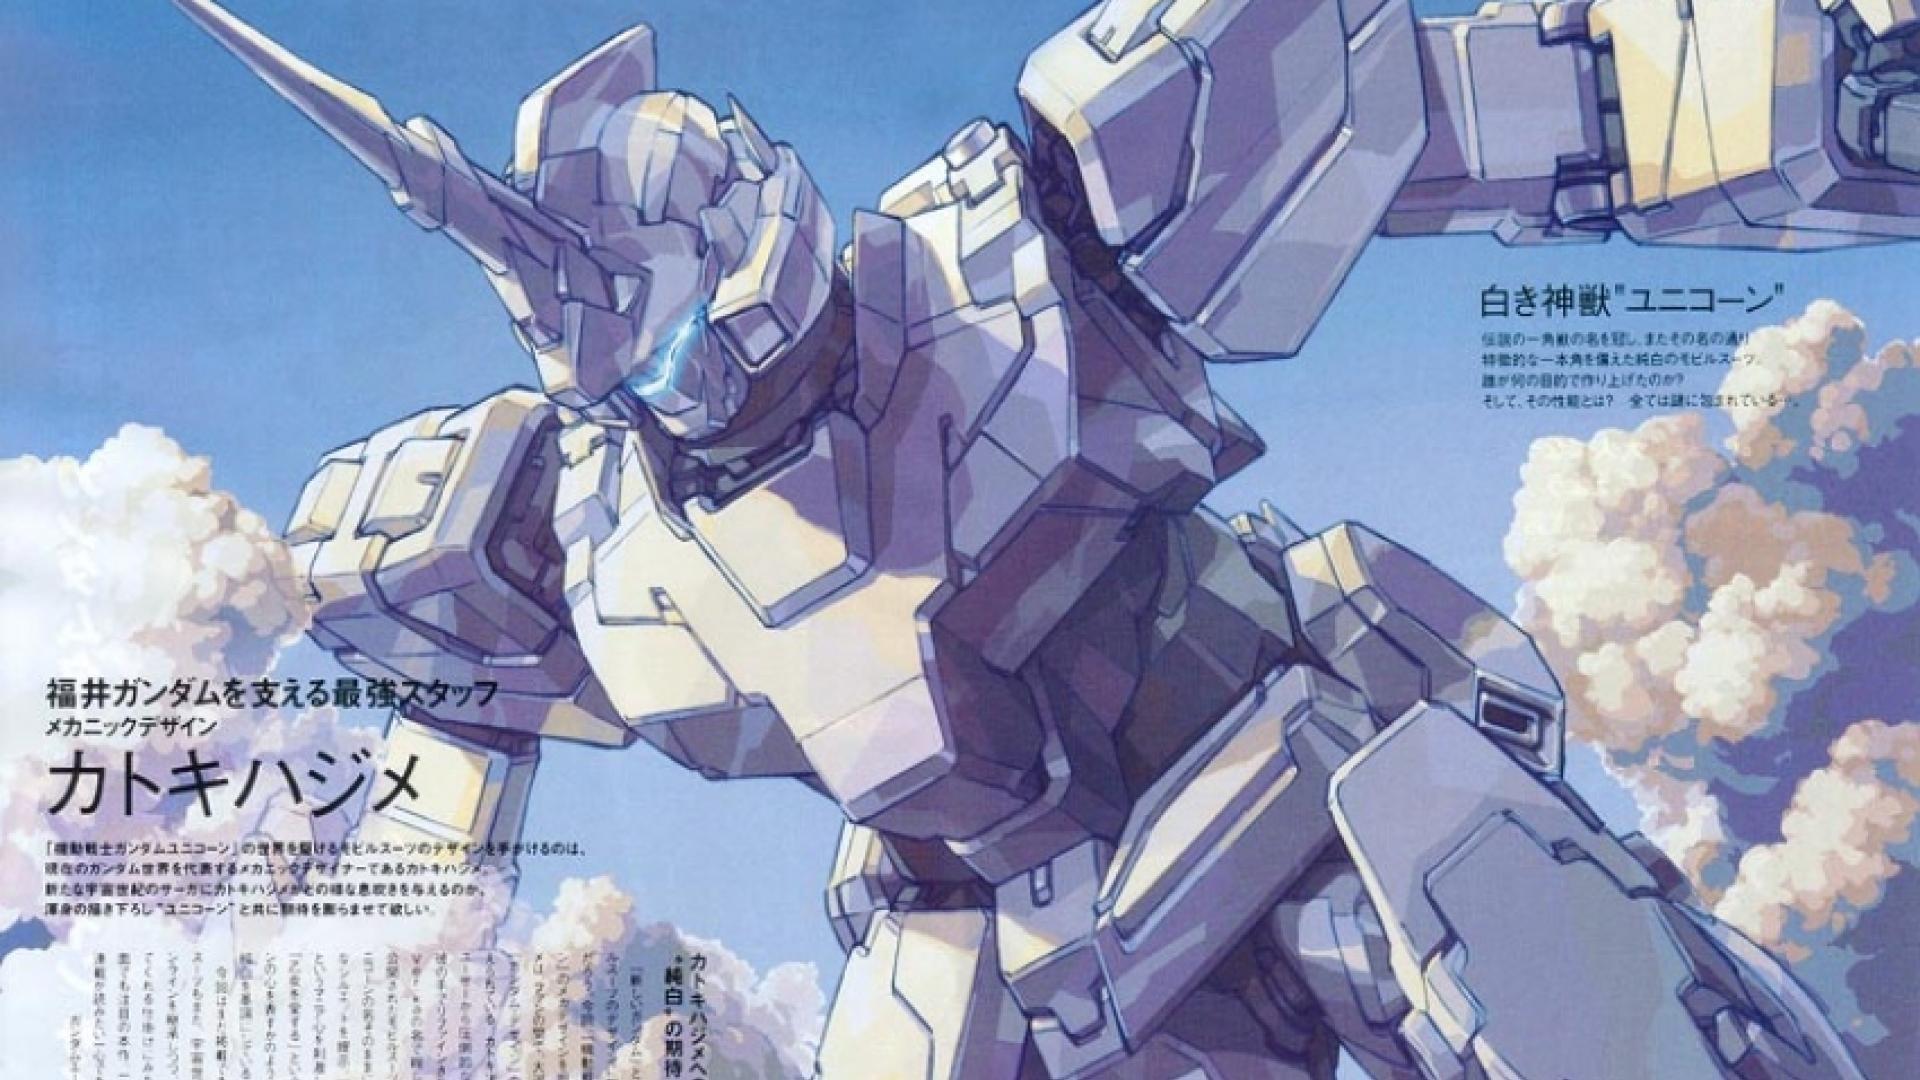 Hd Gundam Themes: Unicorn Gundam Wallpaper ·① WallpaperTag